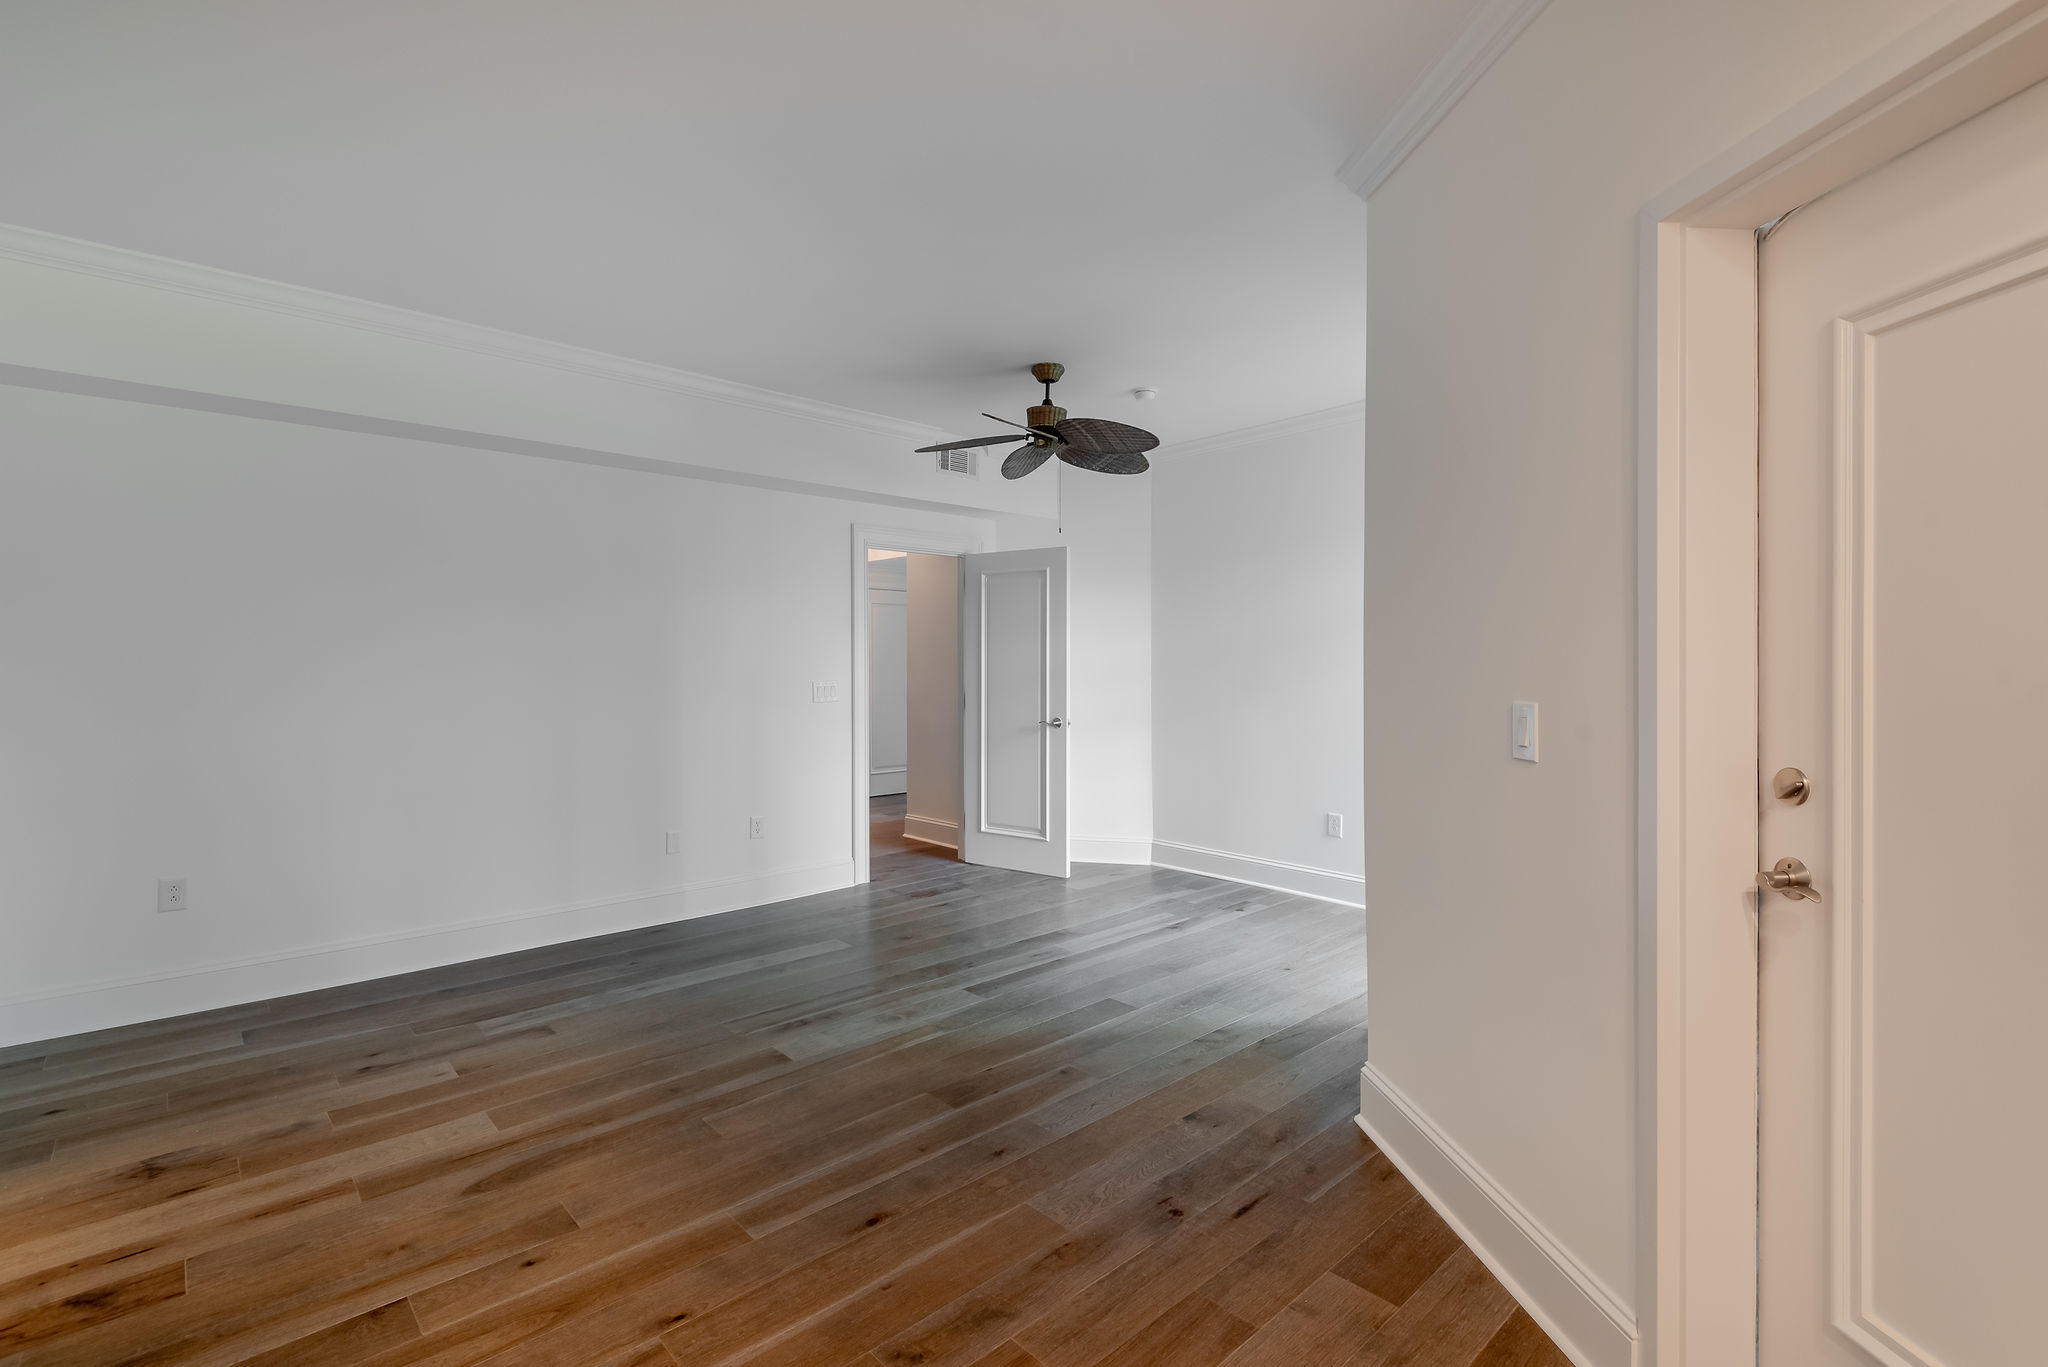 Renaissance On Chas Harbor Homes For Sale - 211 Plaza, Mount Pleasant, SC - 40